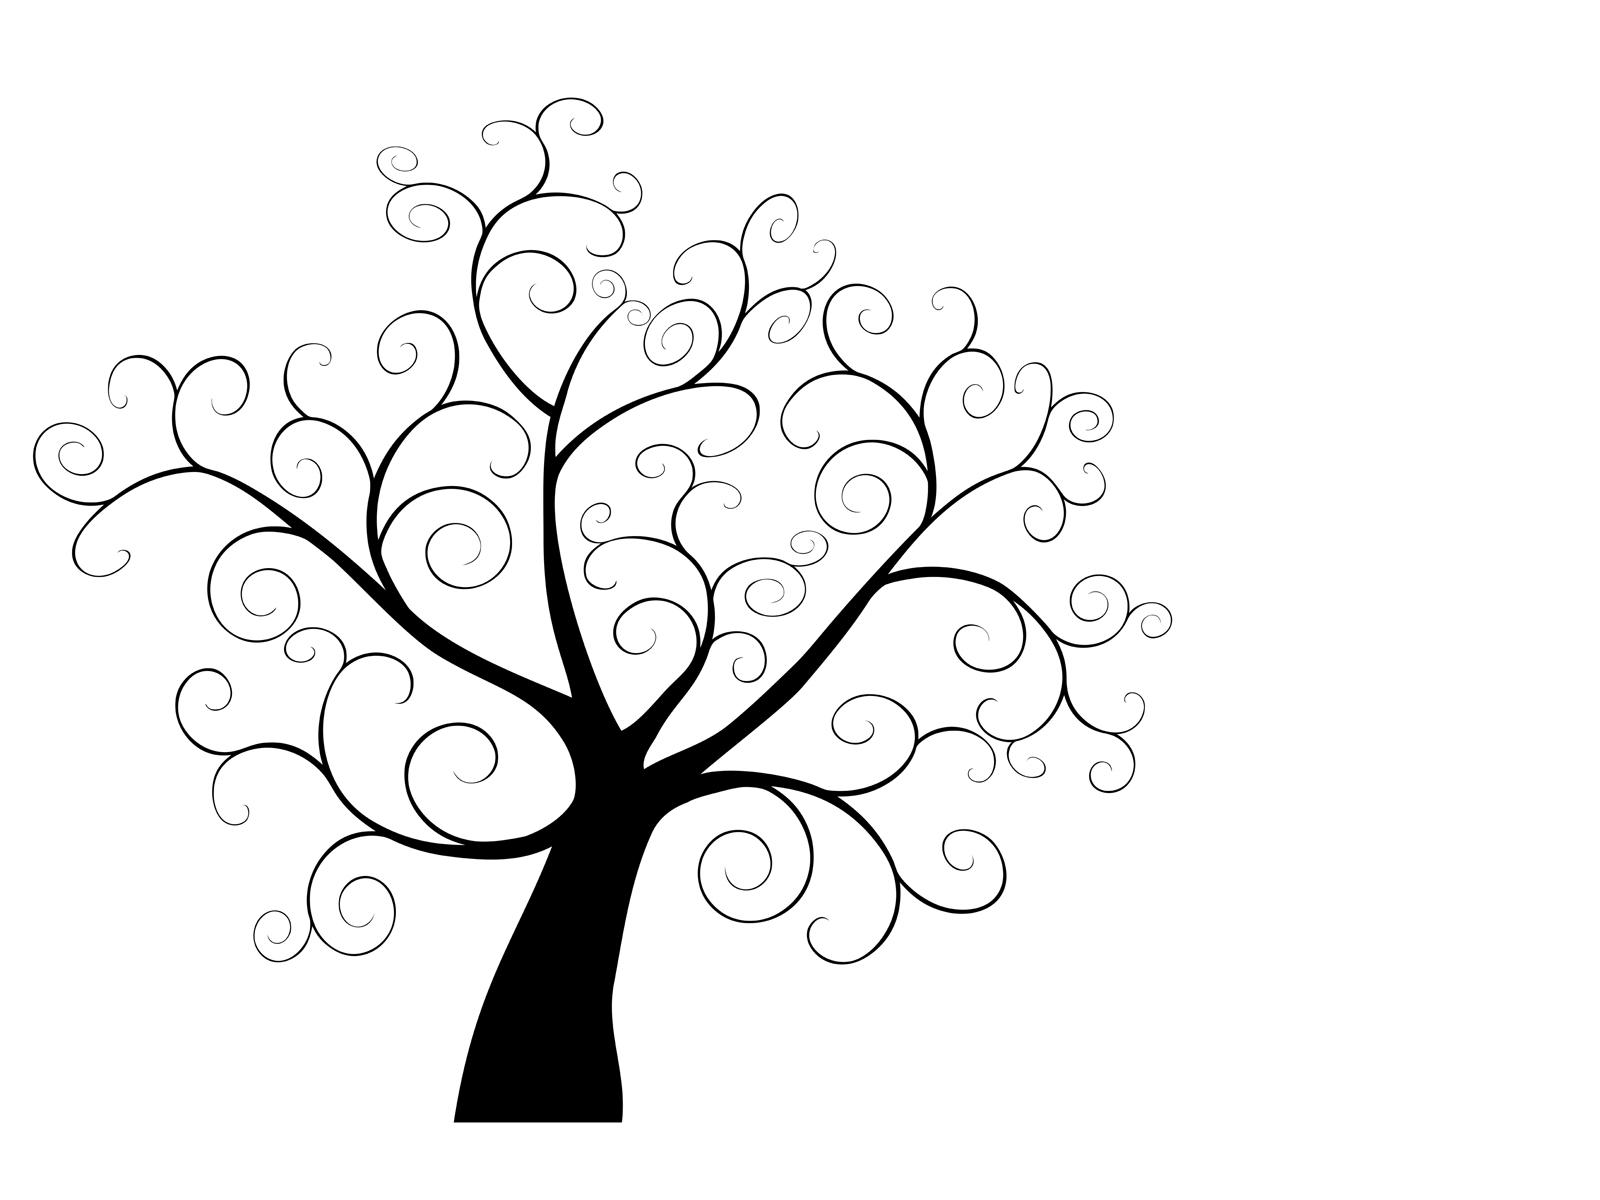 1600x1200 Swirly Tree Ppt Backgrounds, Swirly Tree Ppt Photos, Swirly Tree